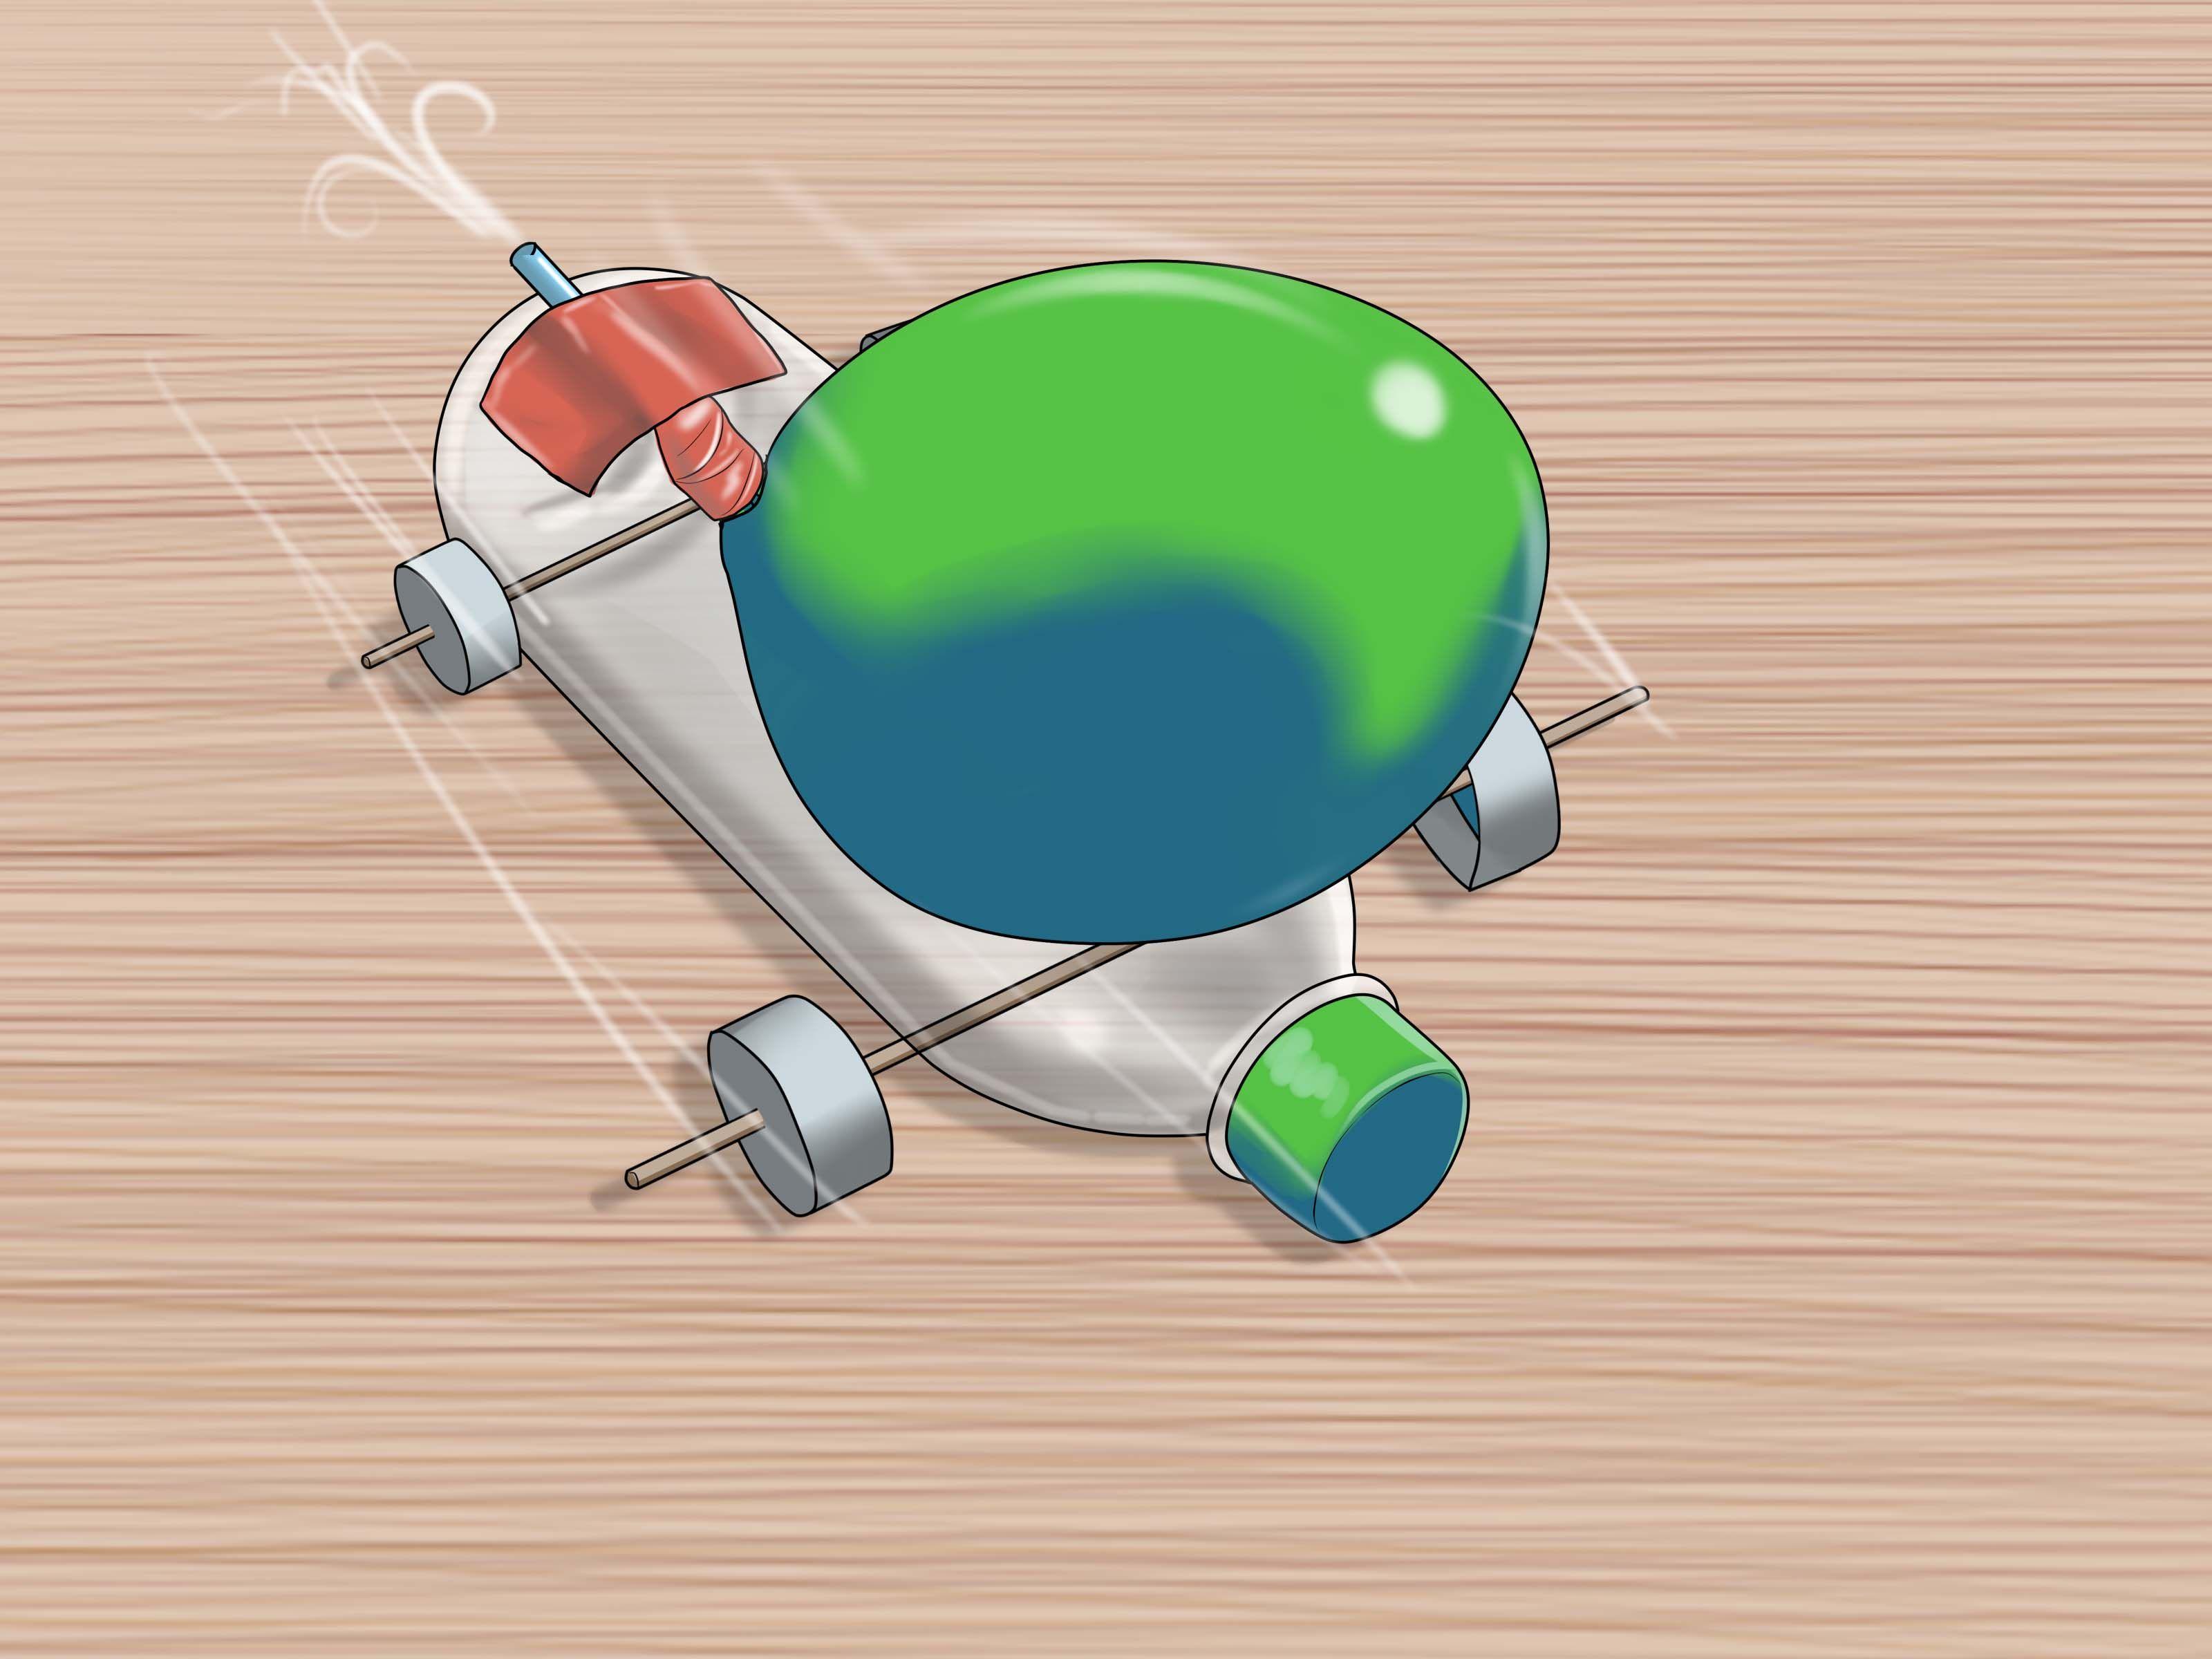 GREAT FAST Balloon Jet Car | Balloon Car Project | Pinterest ...